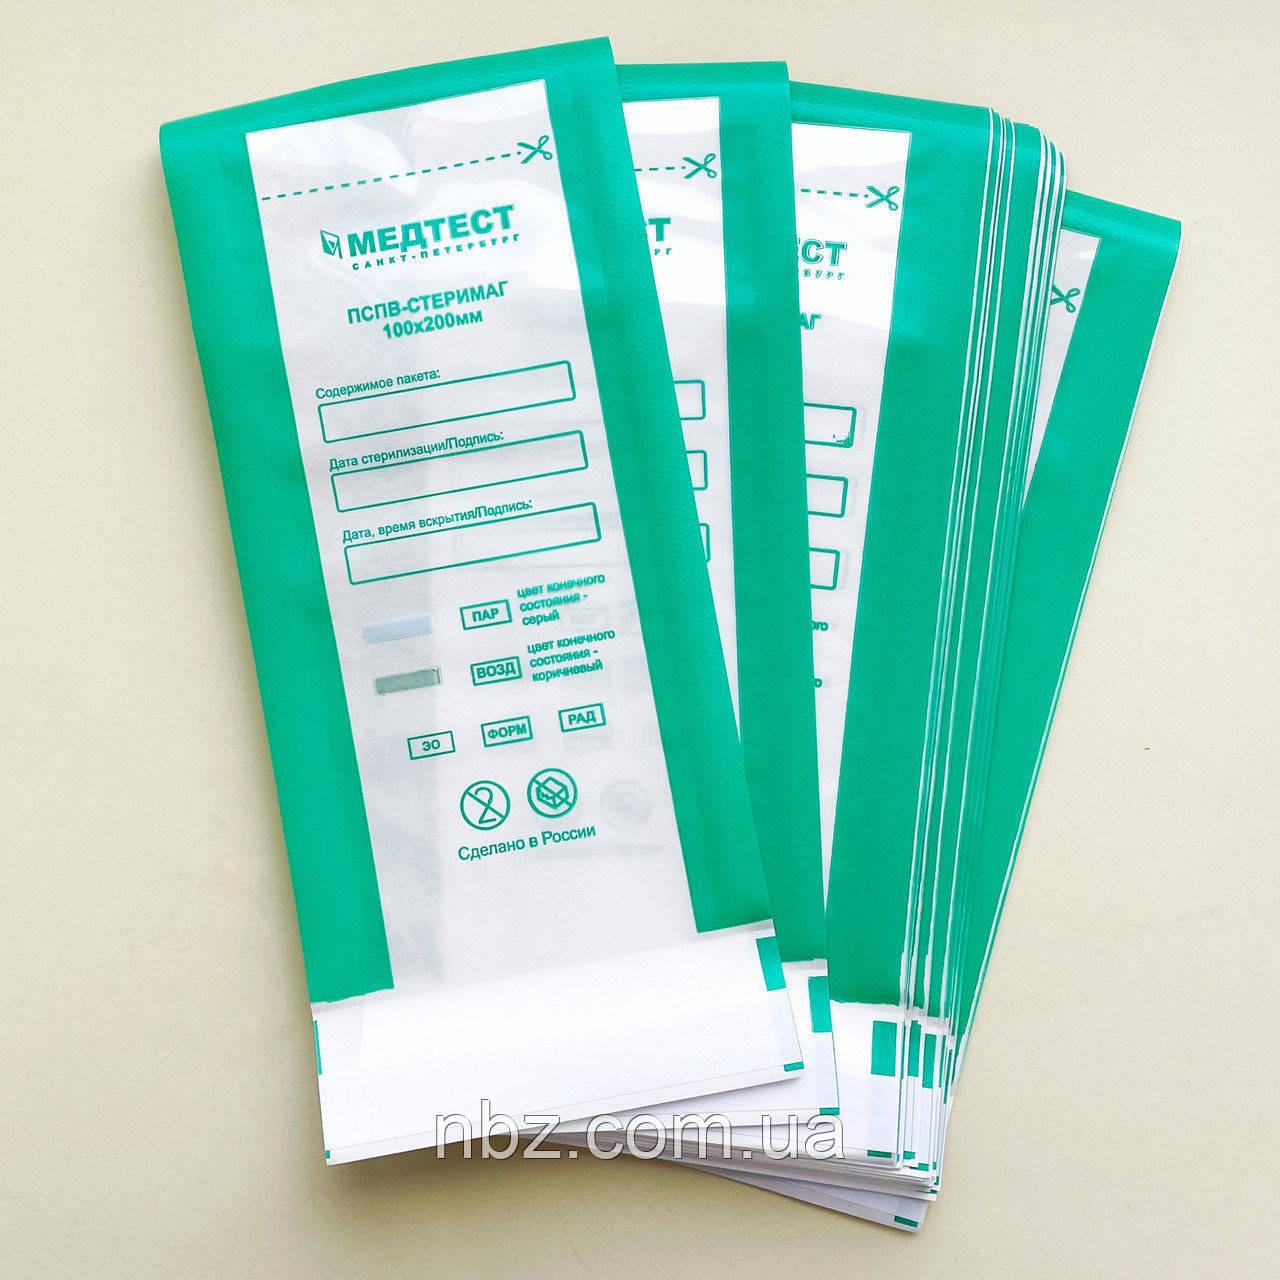 Крафт пакеты Медтест комбинированные (бумажные/полупрозрачные), 100х200 мм, 100 шт